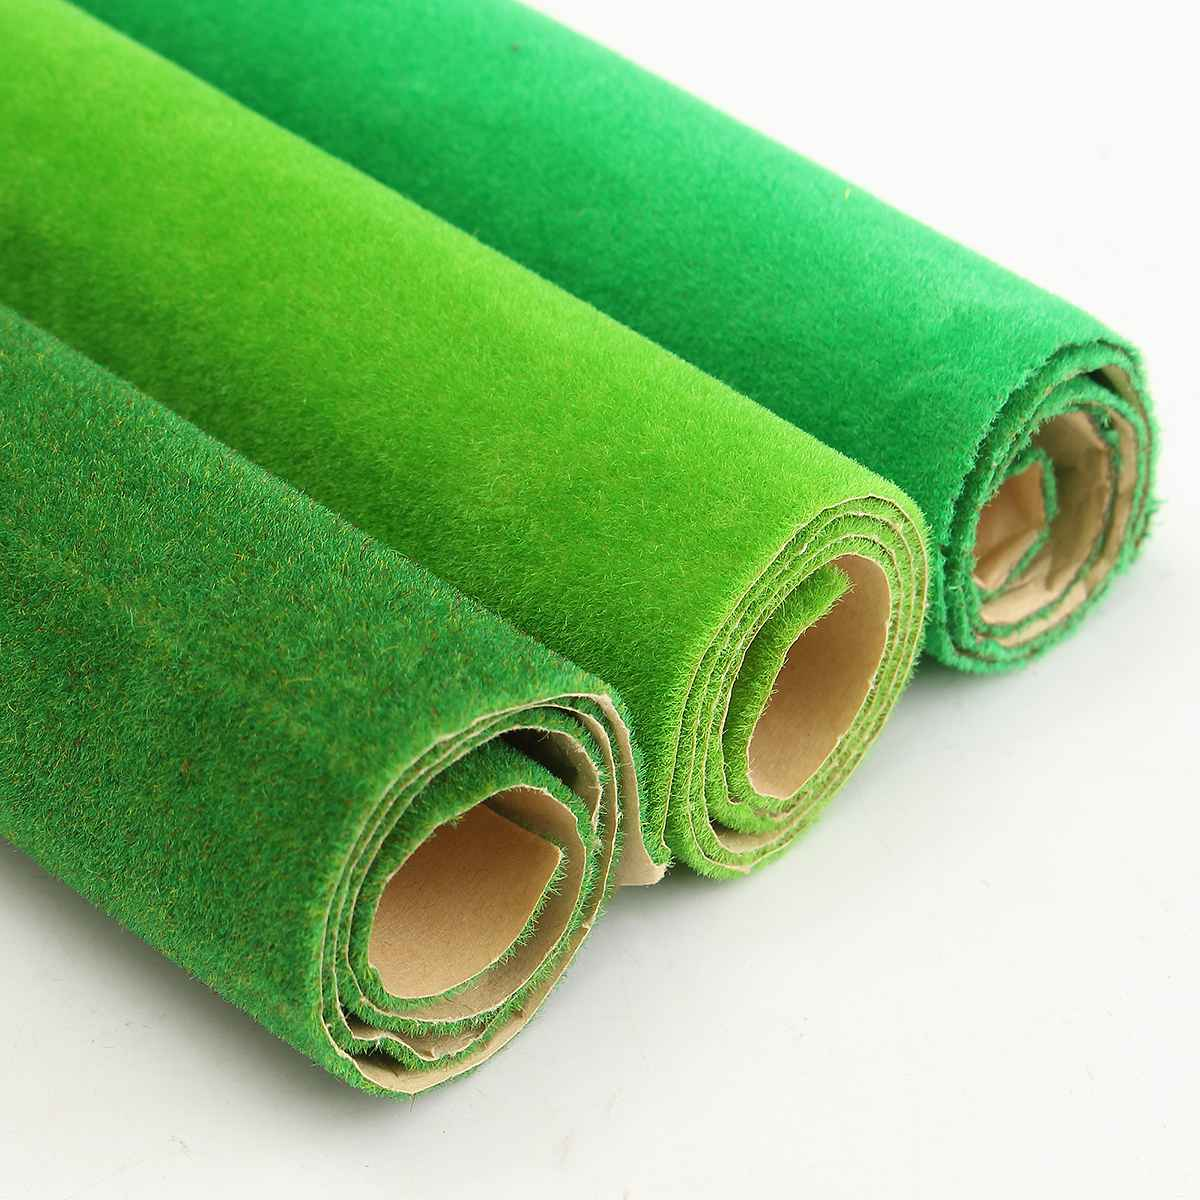 50x50cm 3 Colors Grass Mat Green Artificial Lawns Carpets For Building Model Garden Moss Miniatures Model Making Floor Decorate